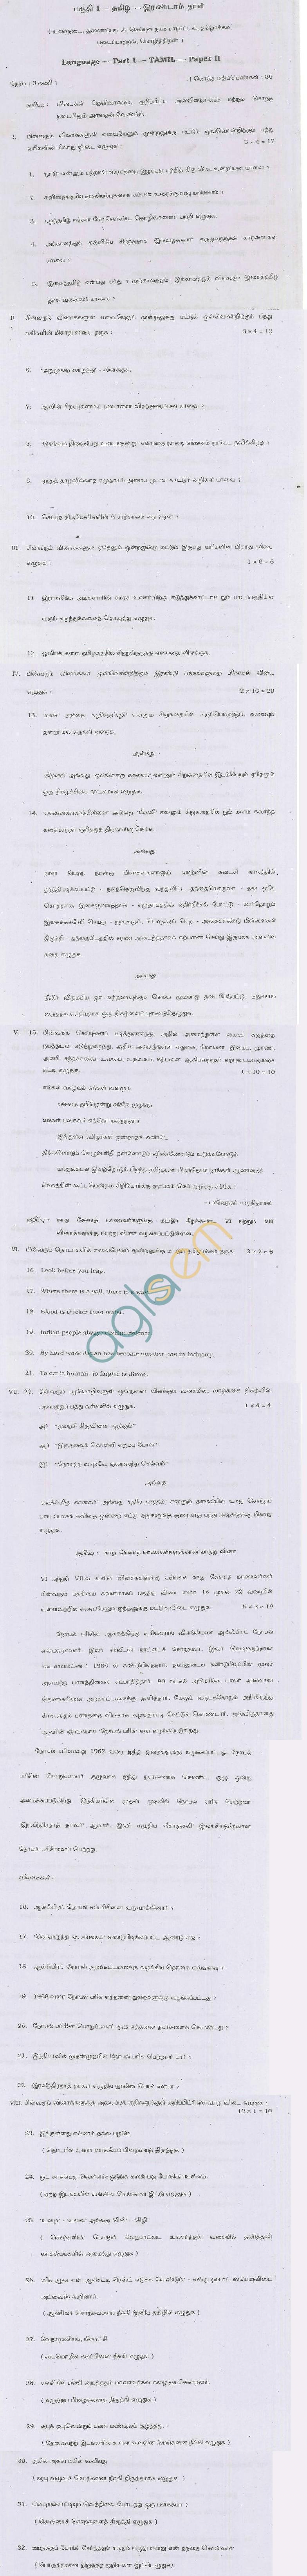 TN Board Higher Secondary (Plus 2)TamilQuestion PapersJune 2011